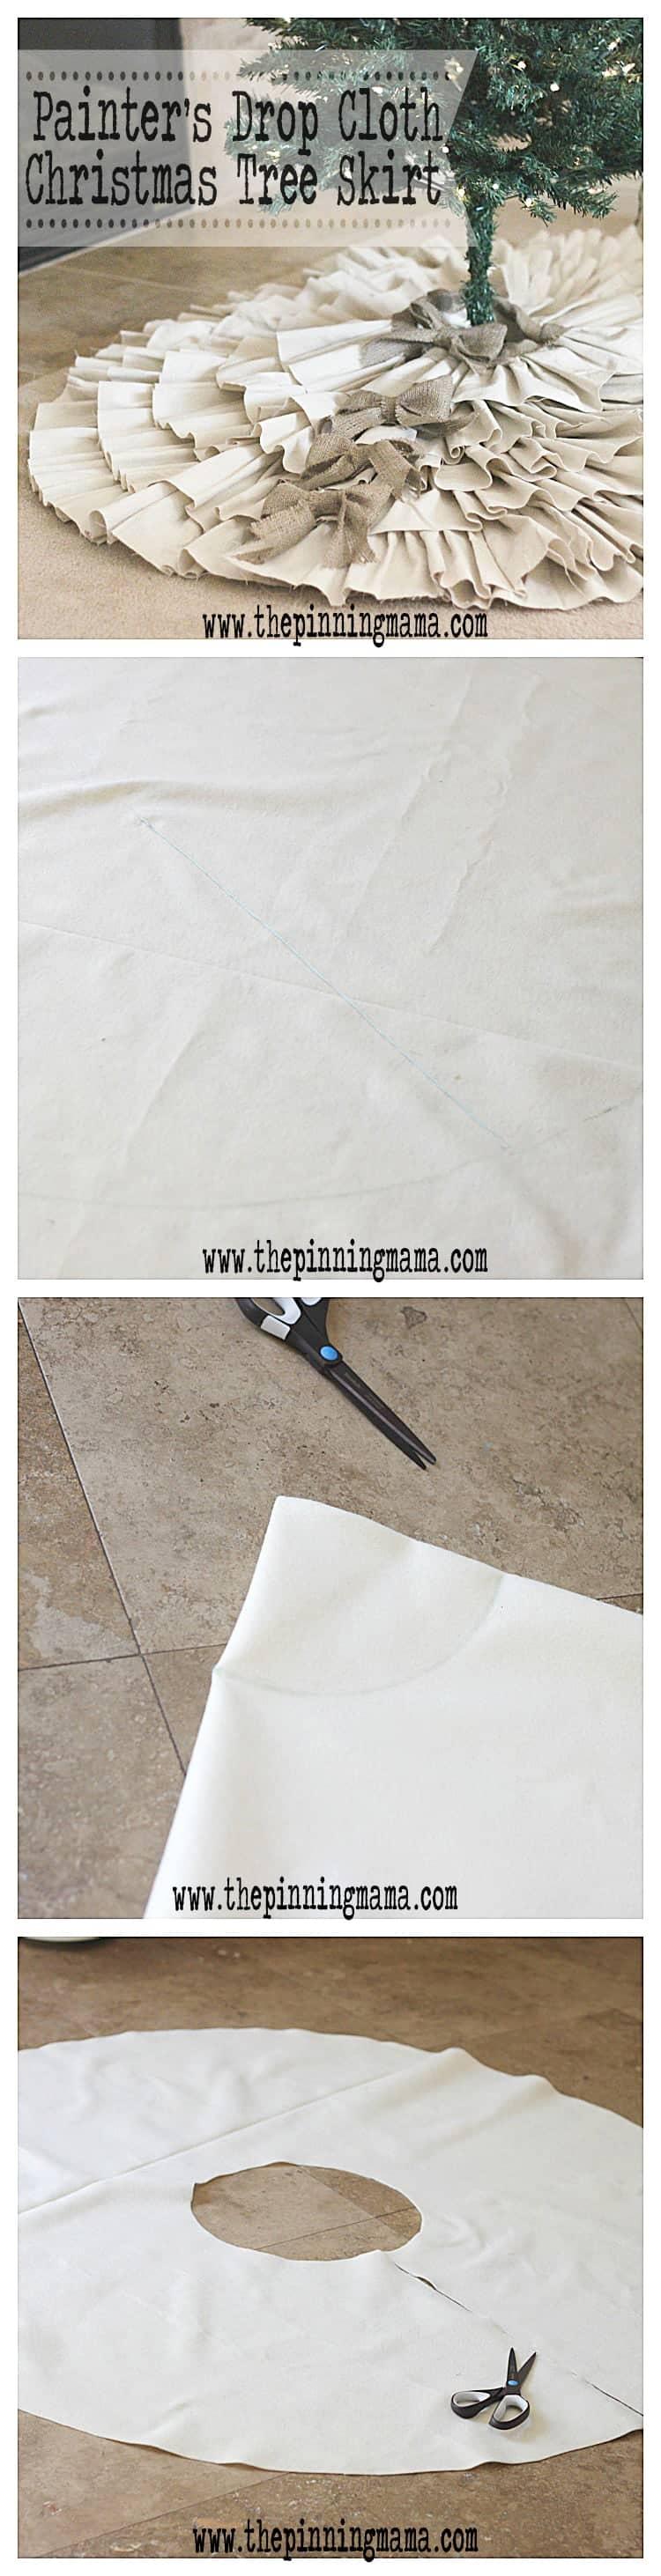 DIY Drop Cloth & Burlap Christmas Tree Skirt by www.thepinningmama.com